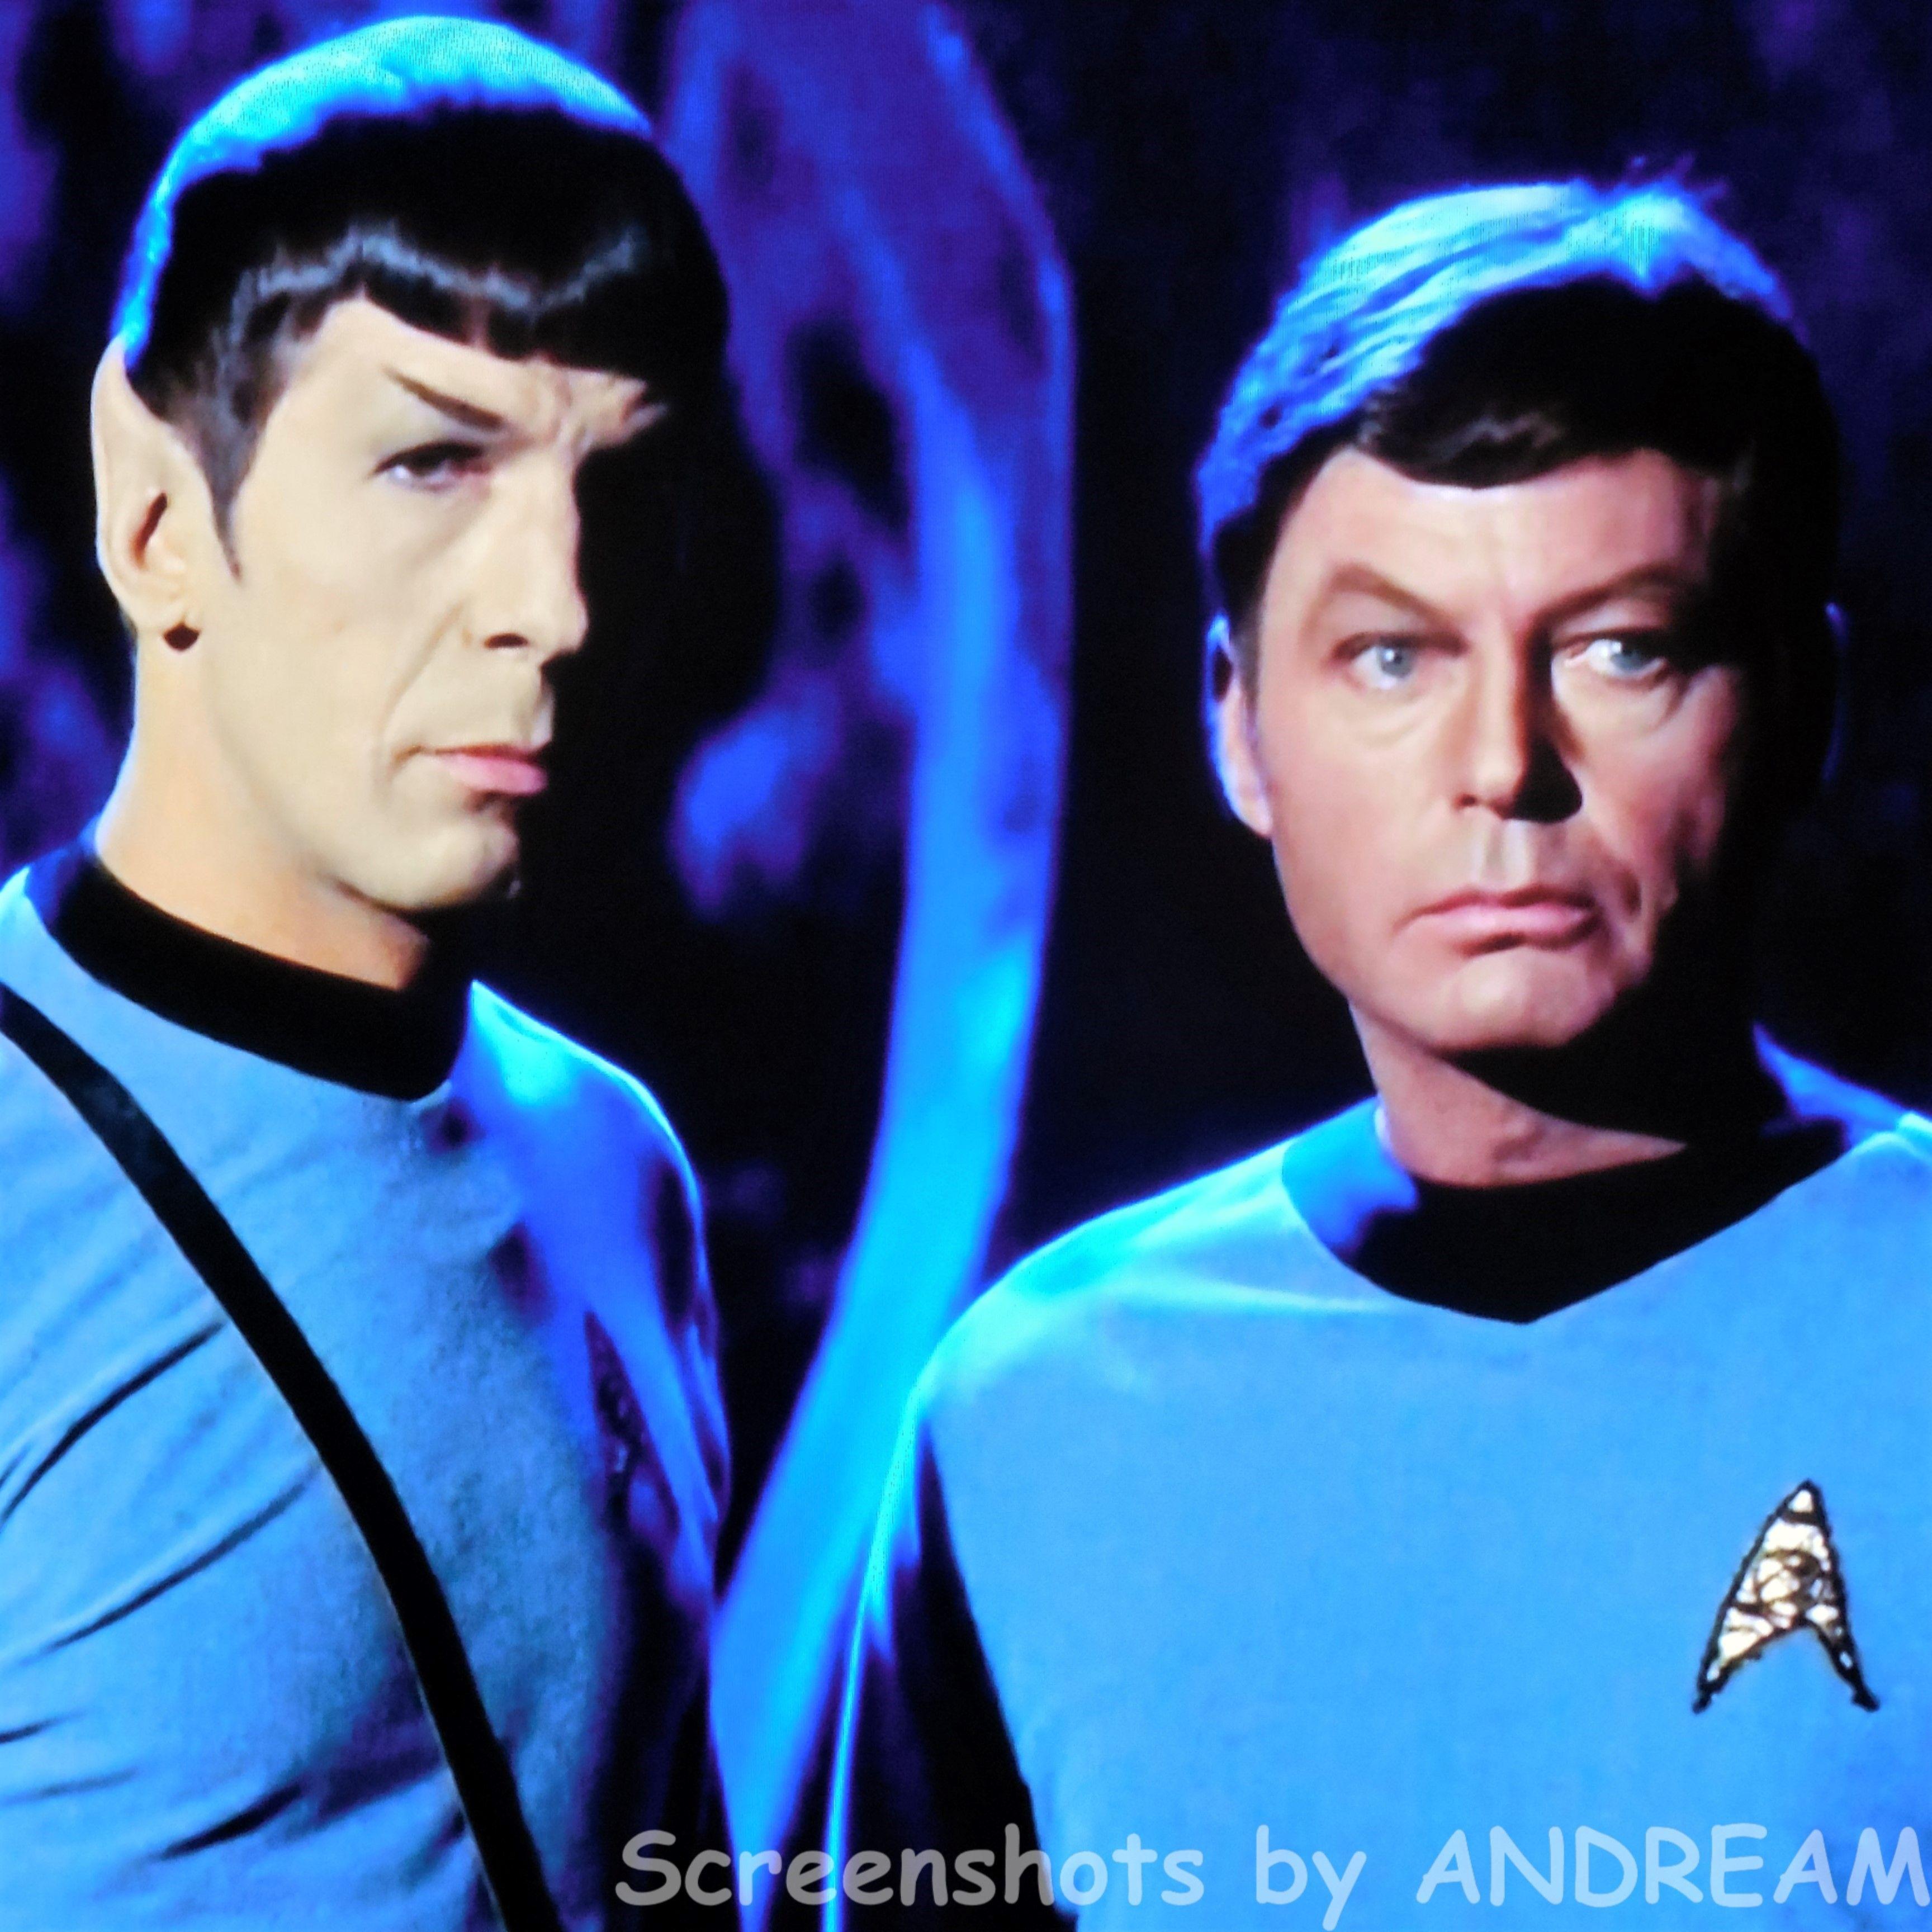 Mr  Spock and Dr  McCoy   STAR TREK    Screenshots that no man has